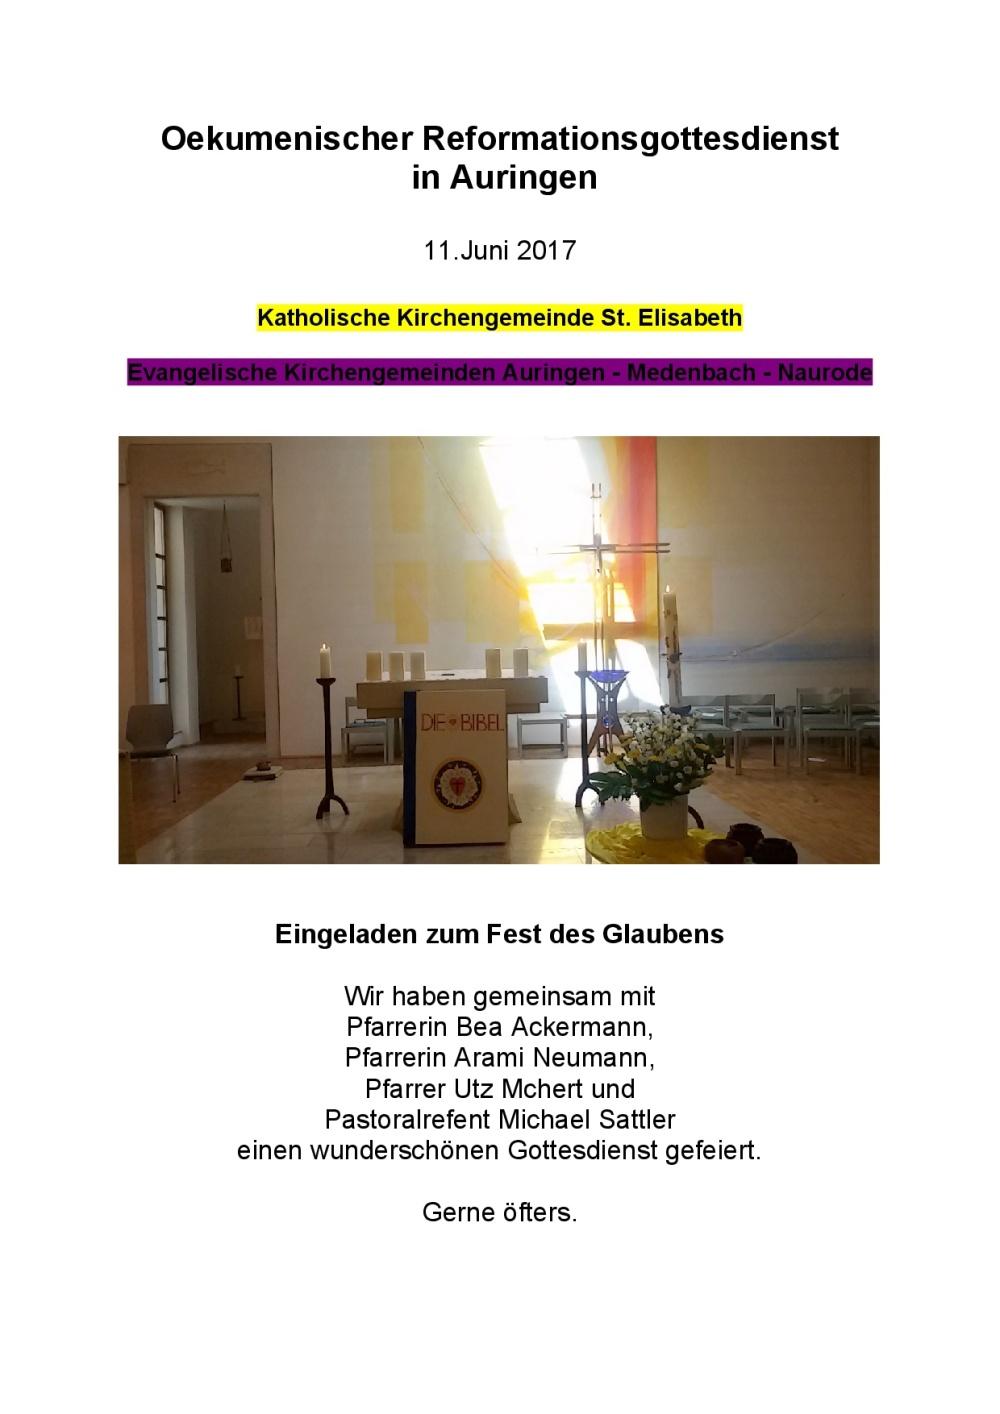 2017-06-11 Oekumenischer Reformationsgodi-001